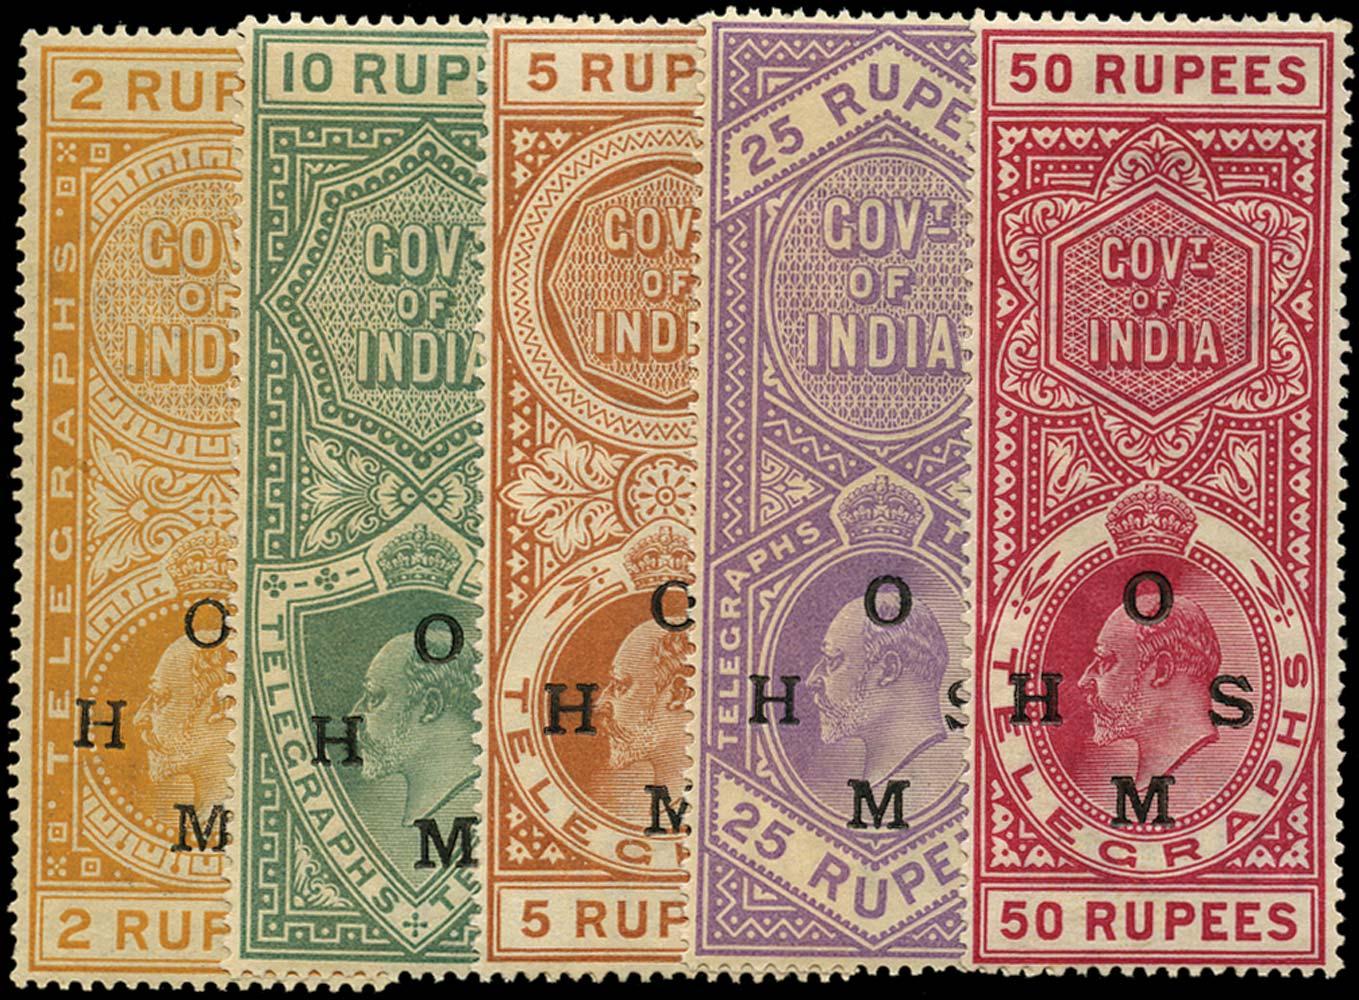 INDIA 1908  SGOT1/5 Telegraph